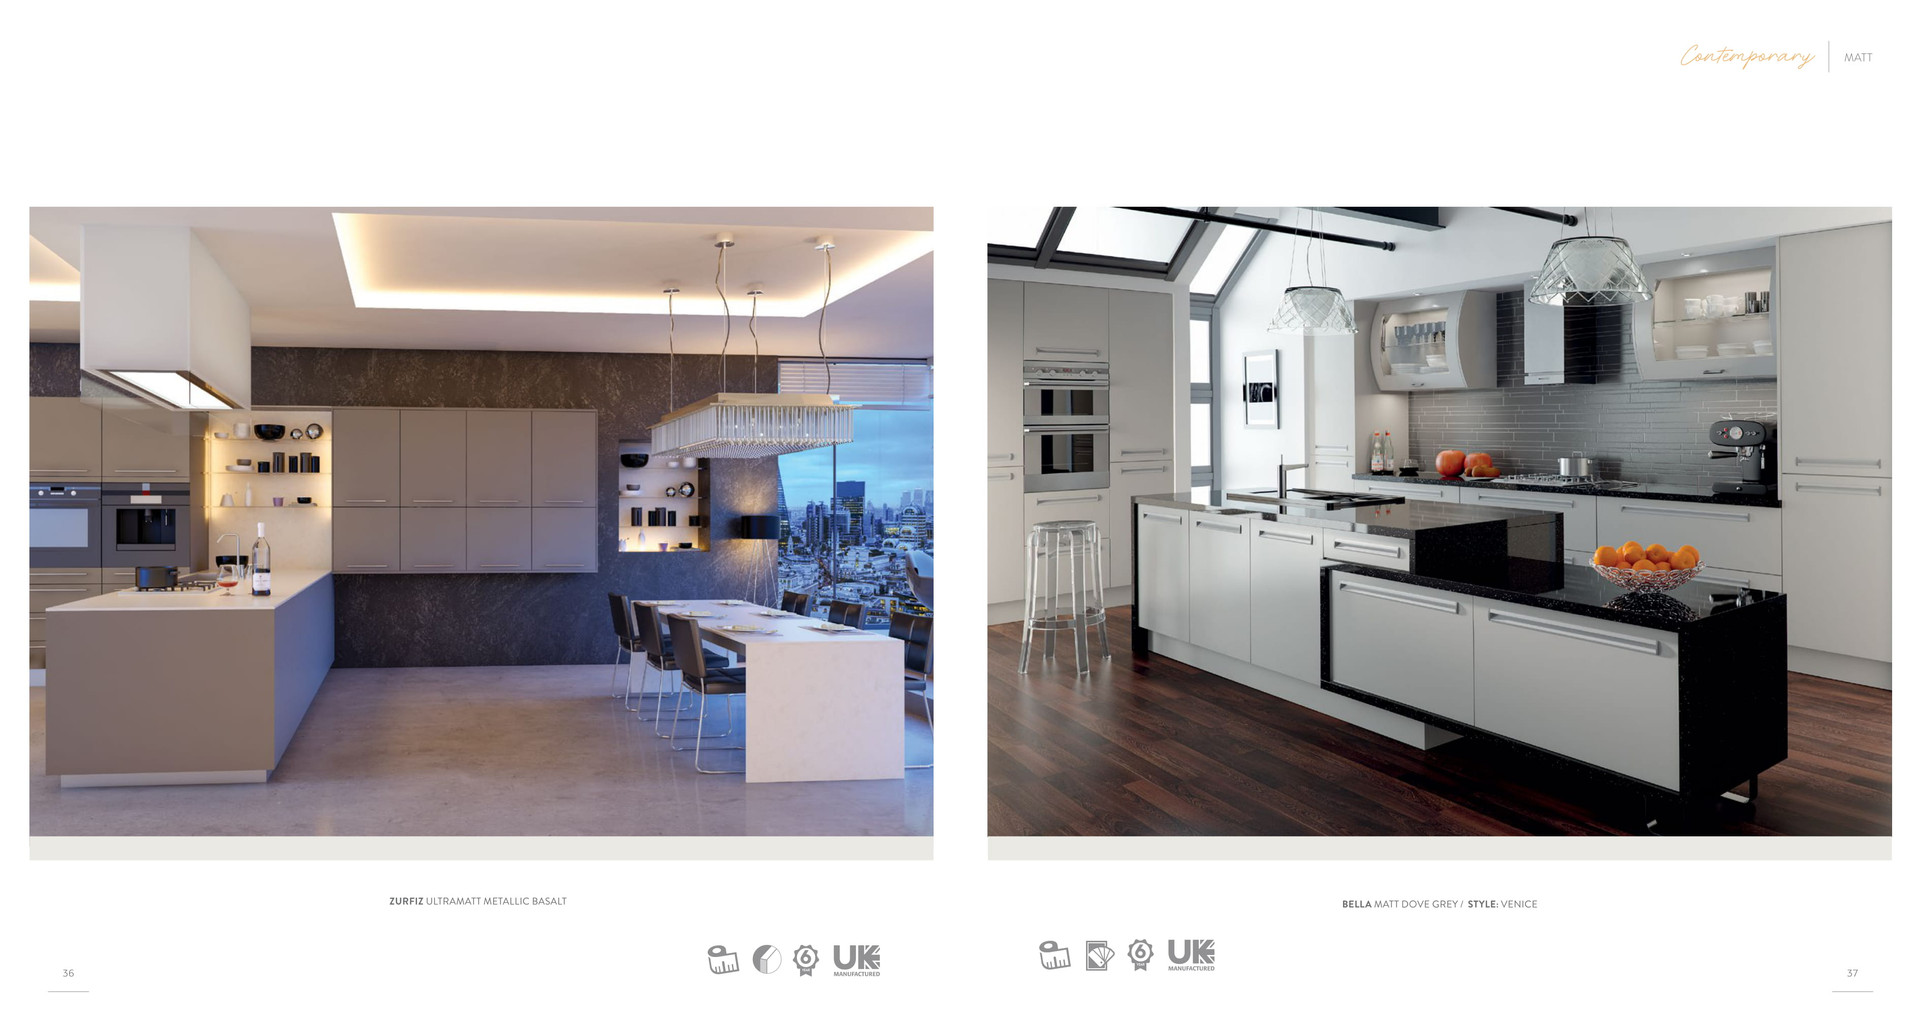 blossom-avenue-kitchen-brochure-2020-19.